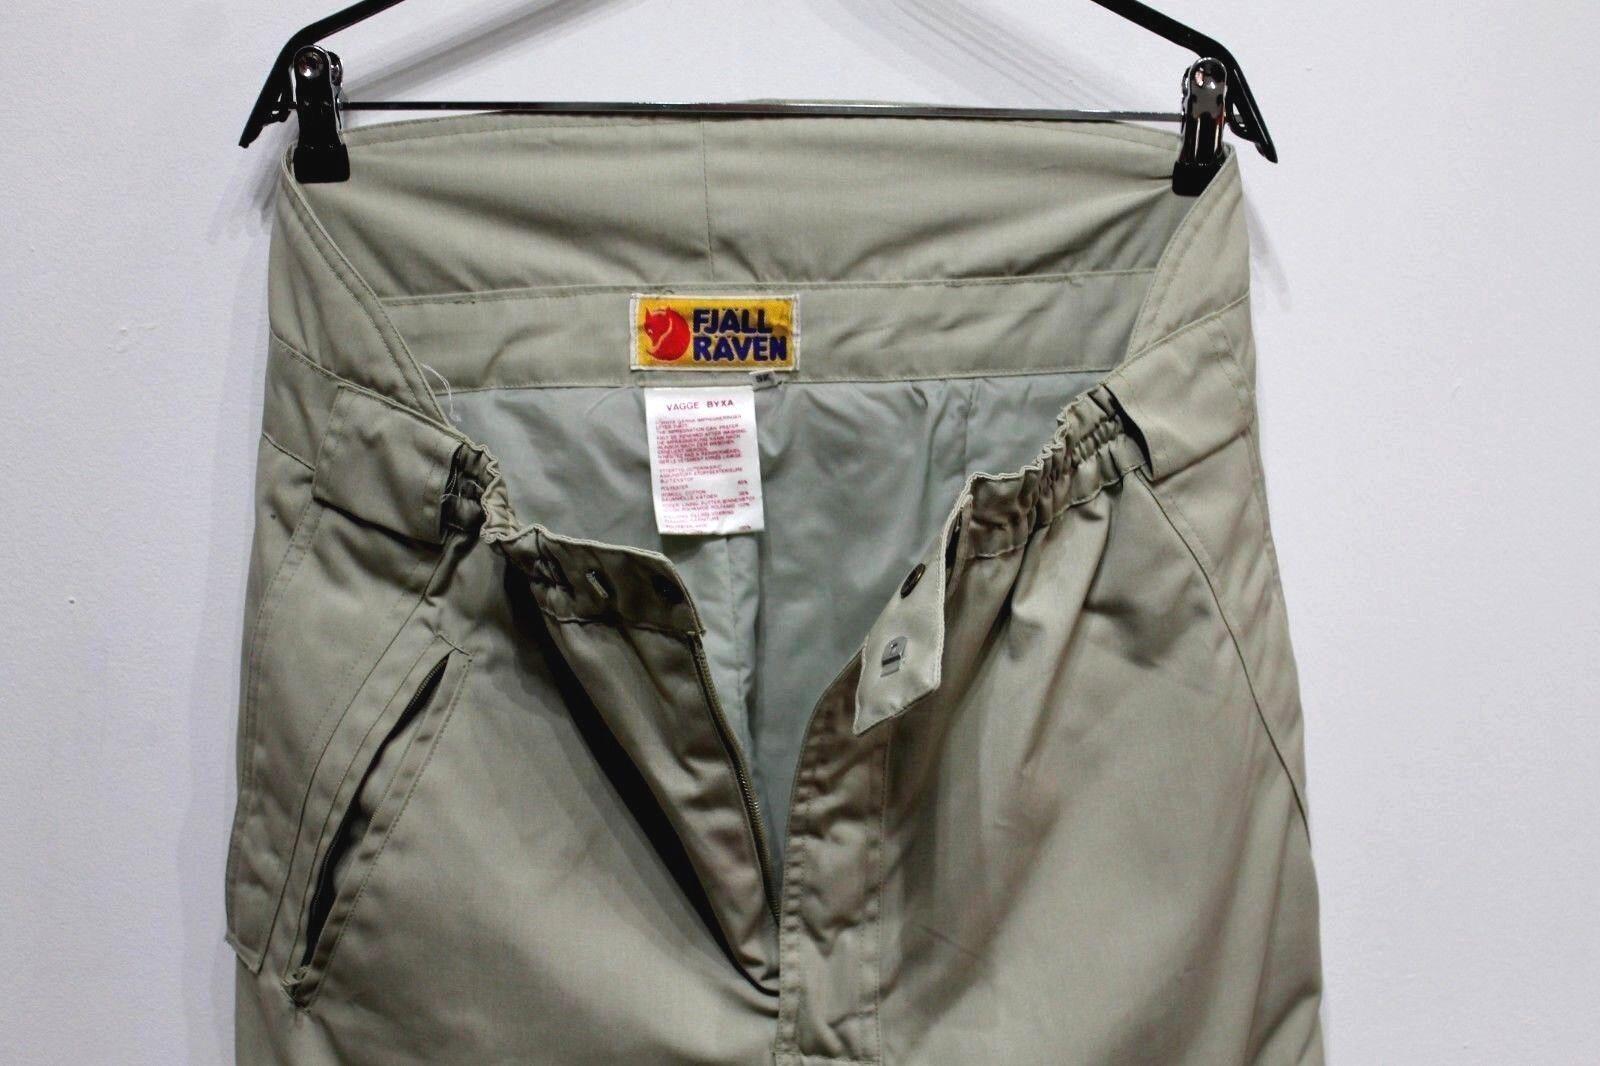 VTG Fjallraven Ski Snow Pants Trousers INSULATE Beige Cotton Poliester Sz. 52